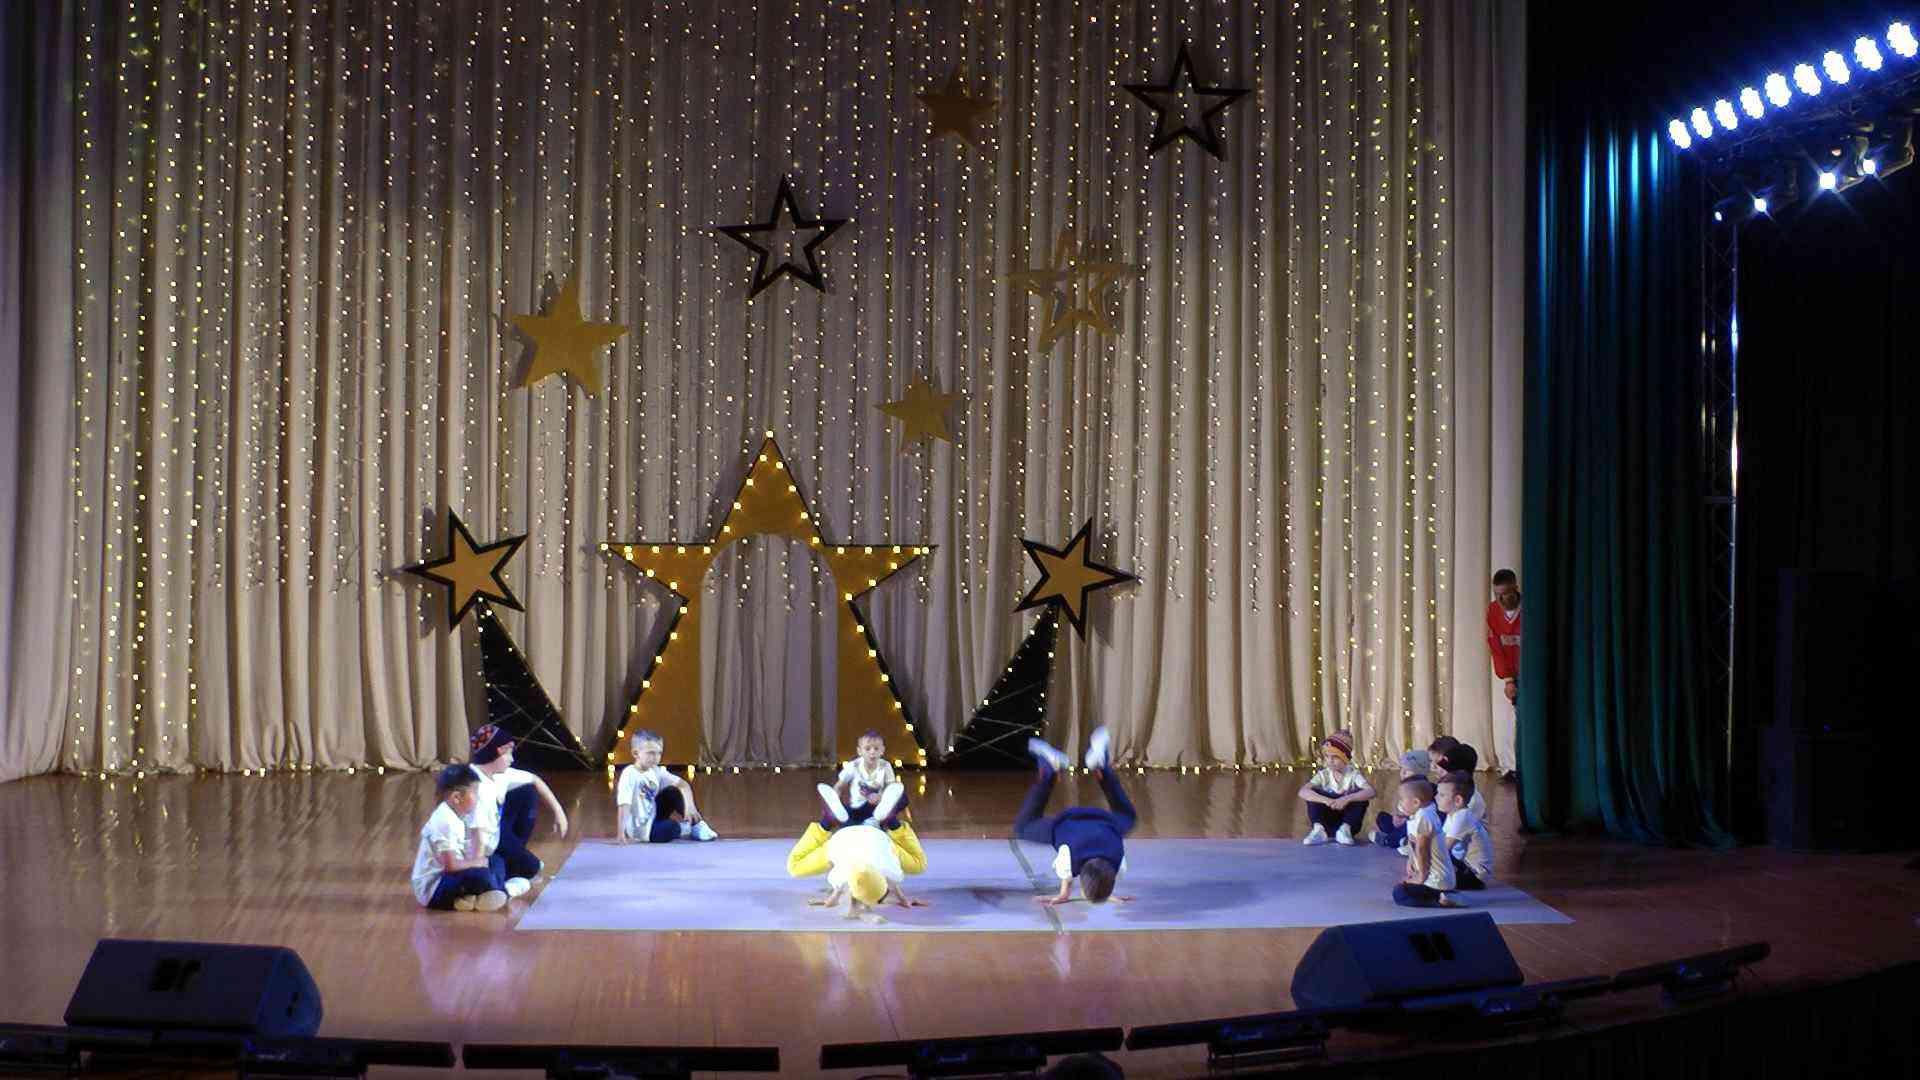 студия танца zara 2021 итоги года